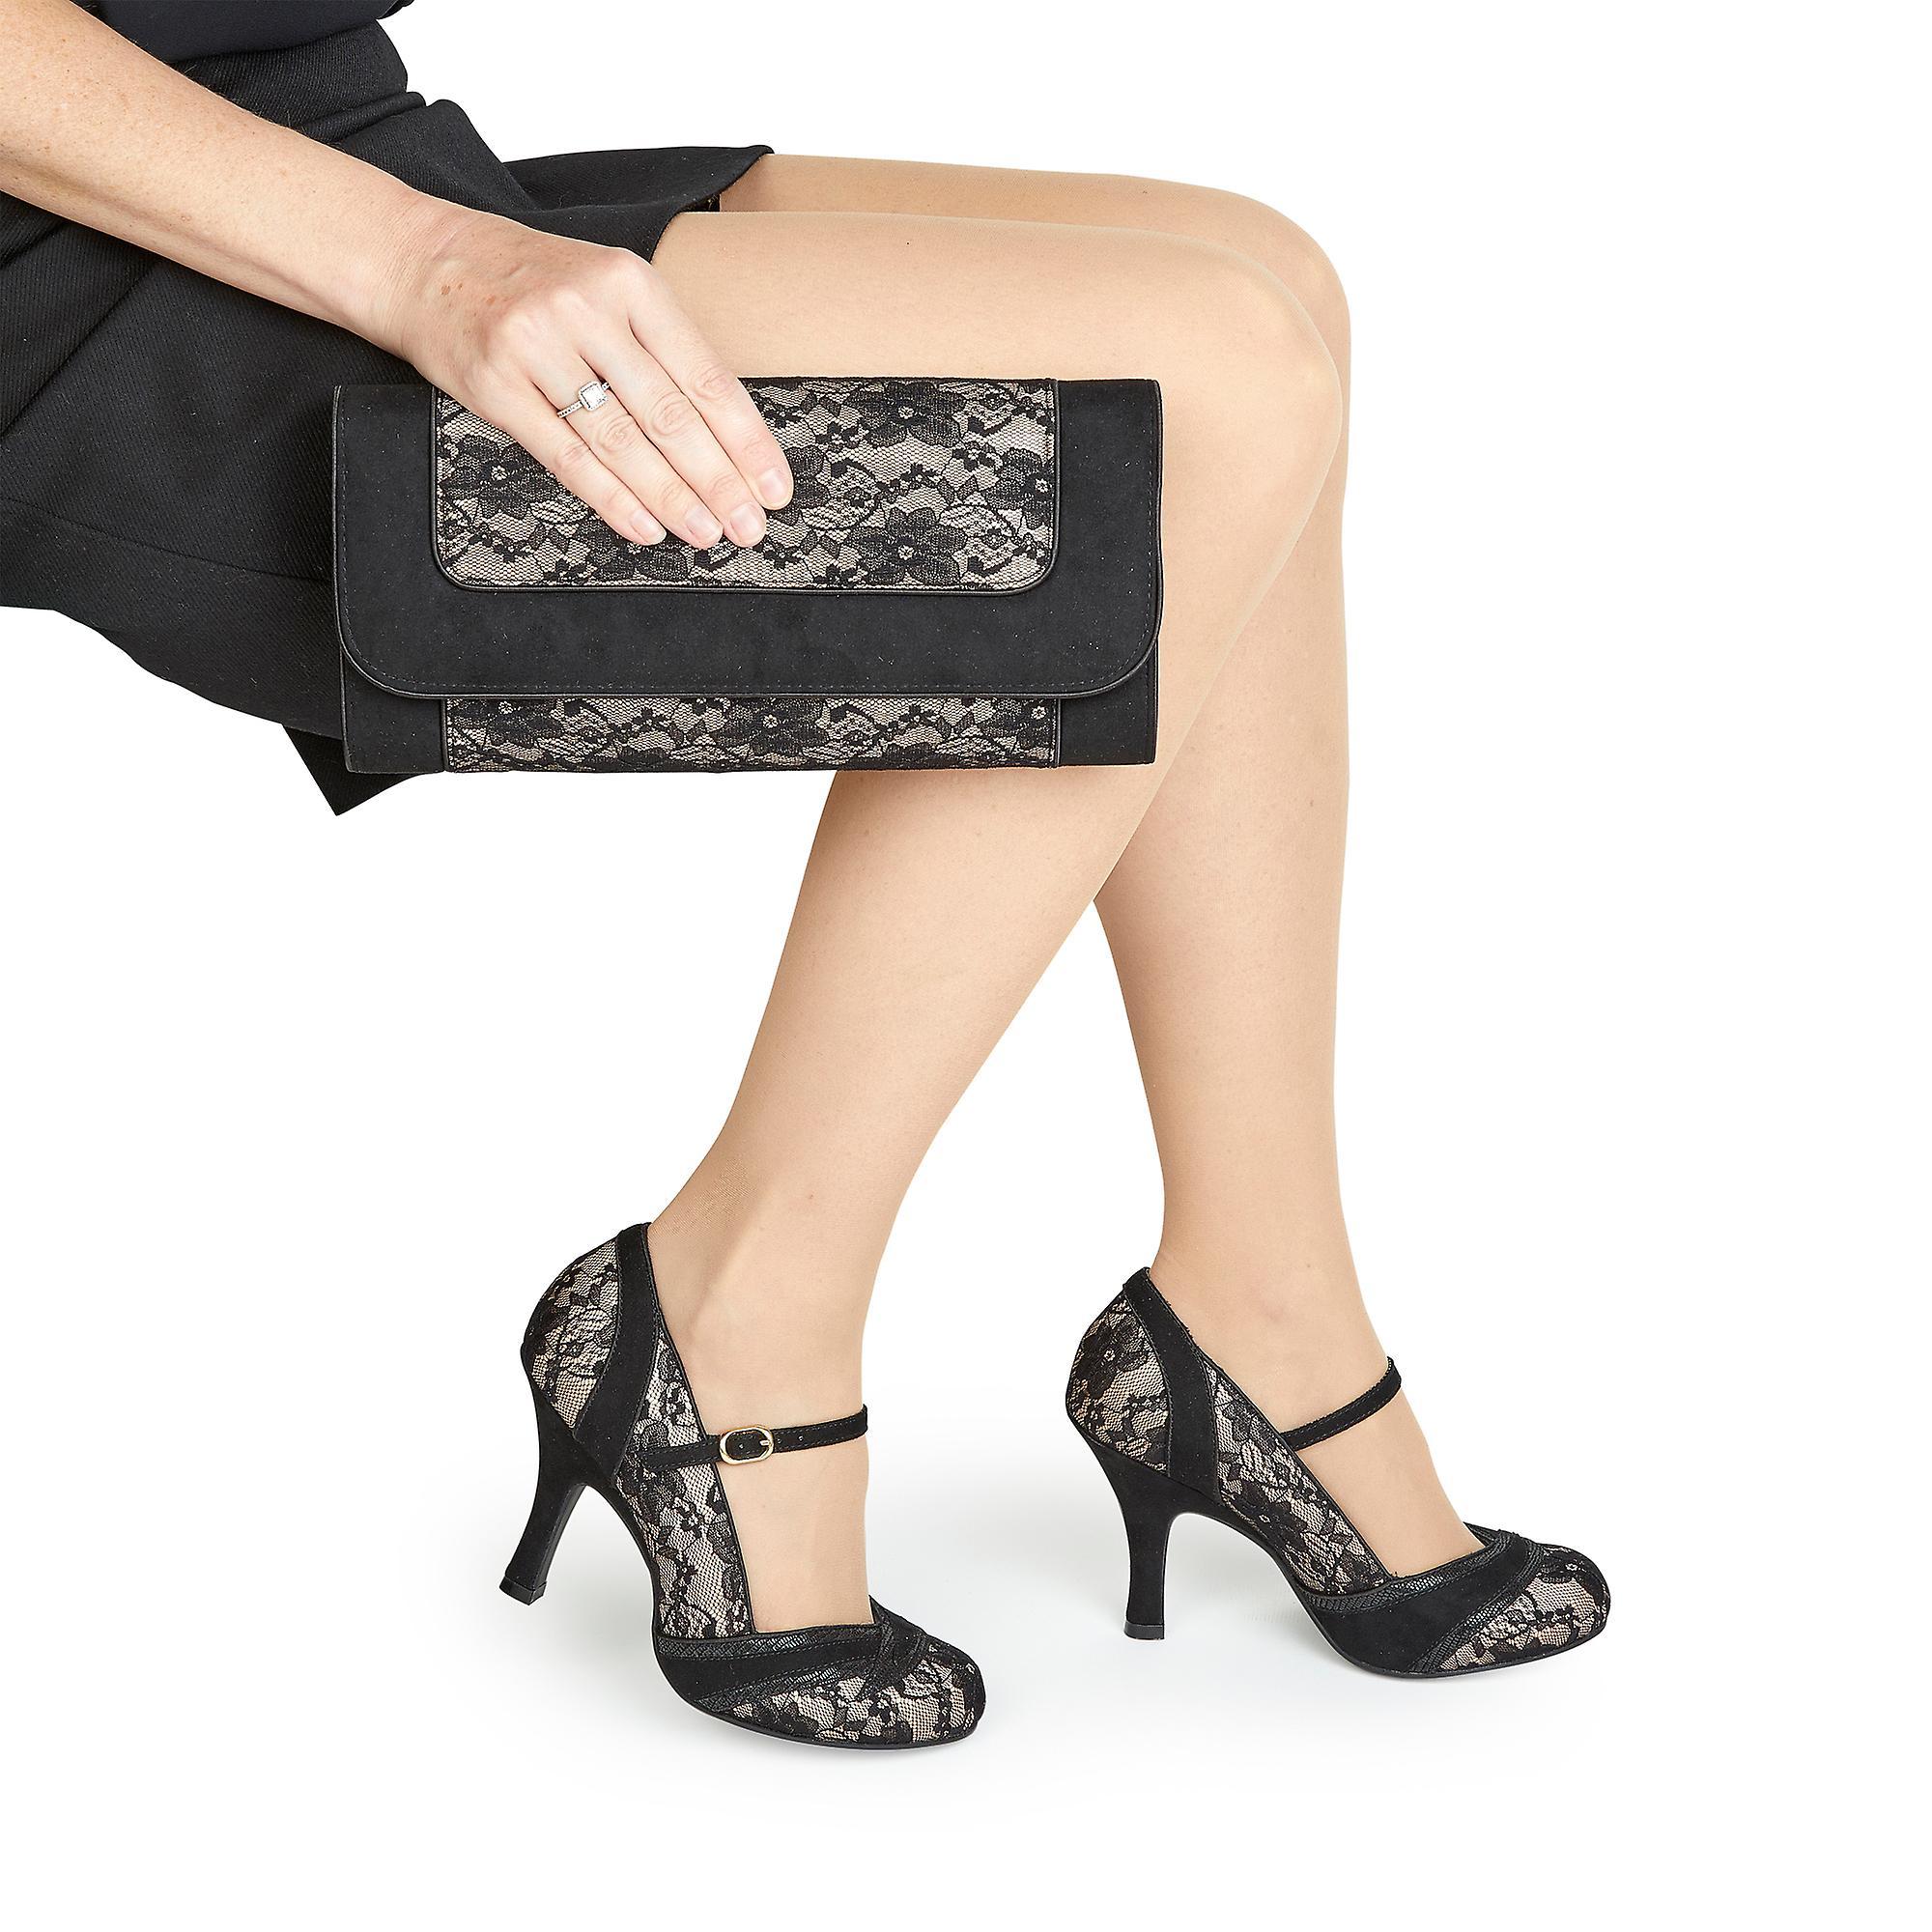 Ruby Shoo Women's Delilah High Heel Mary Jane Shoes